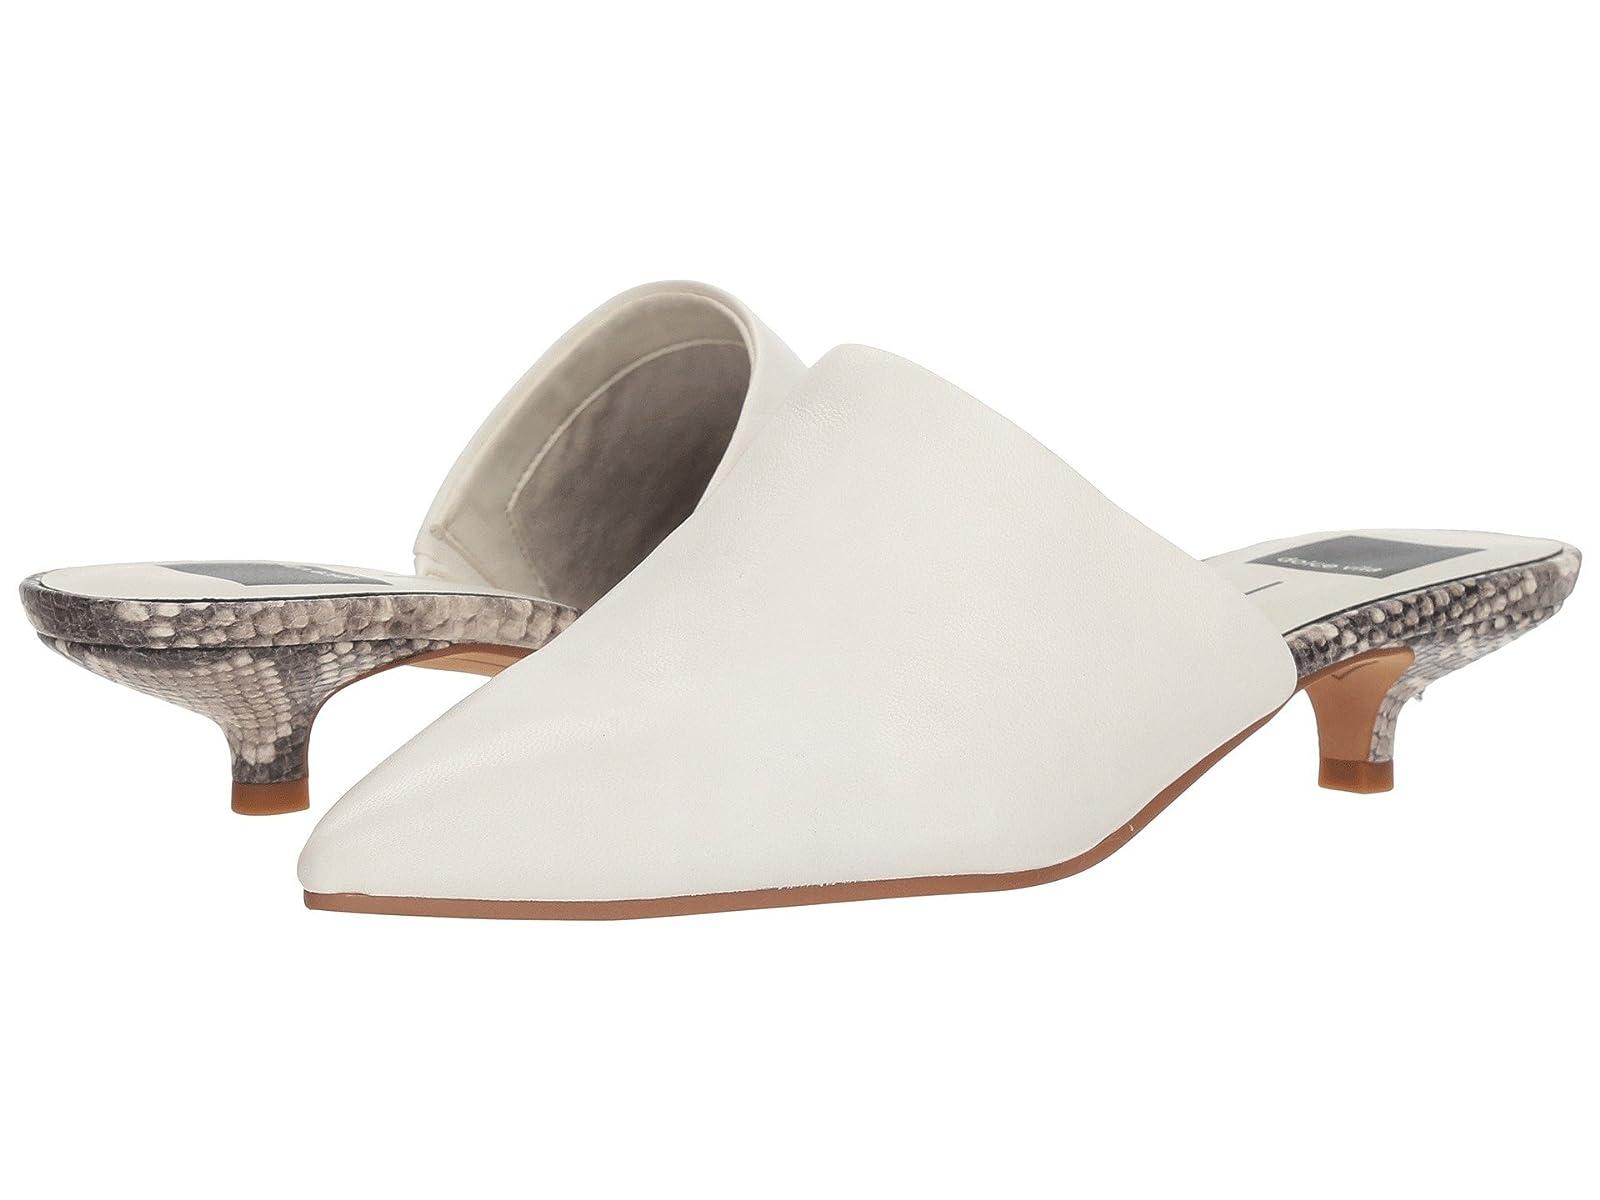 Dolce Vita ObieAtmospheric grades have affordable shoes